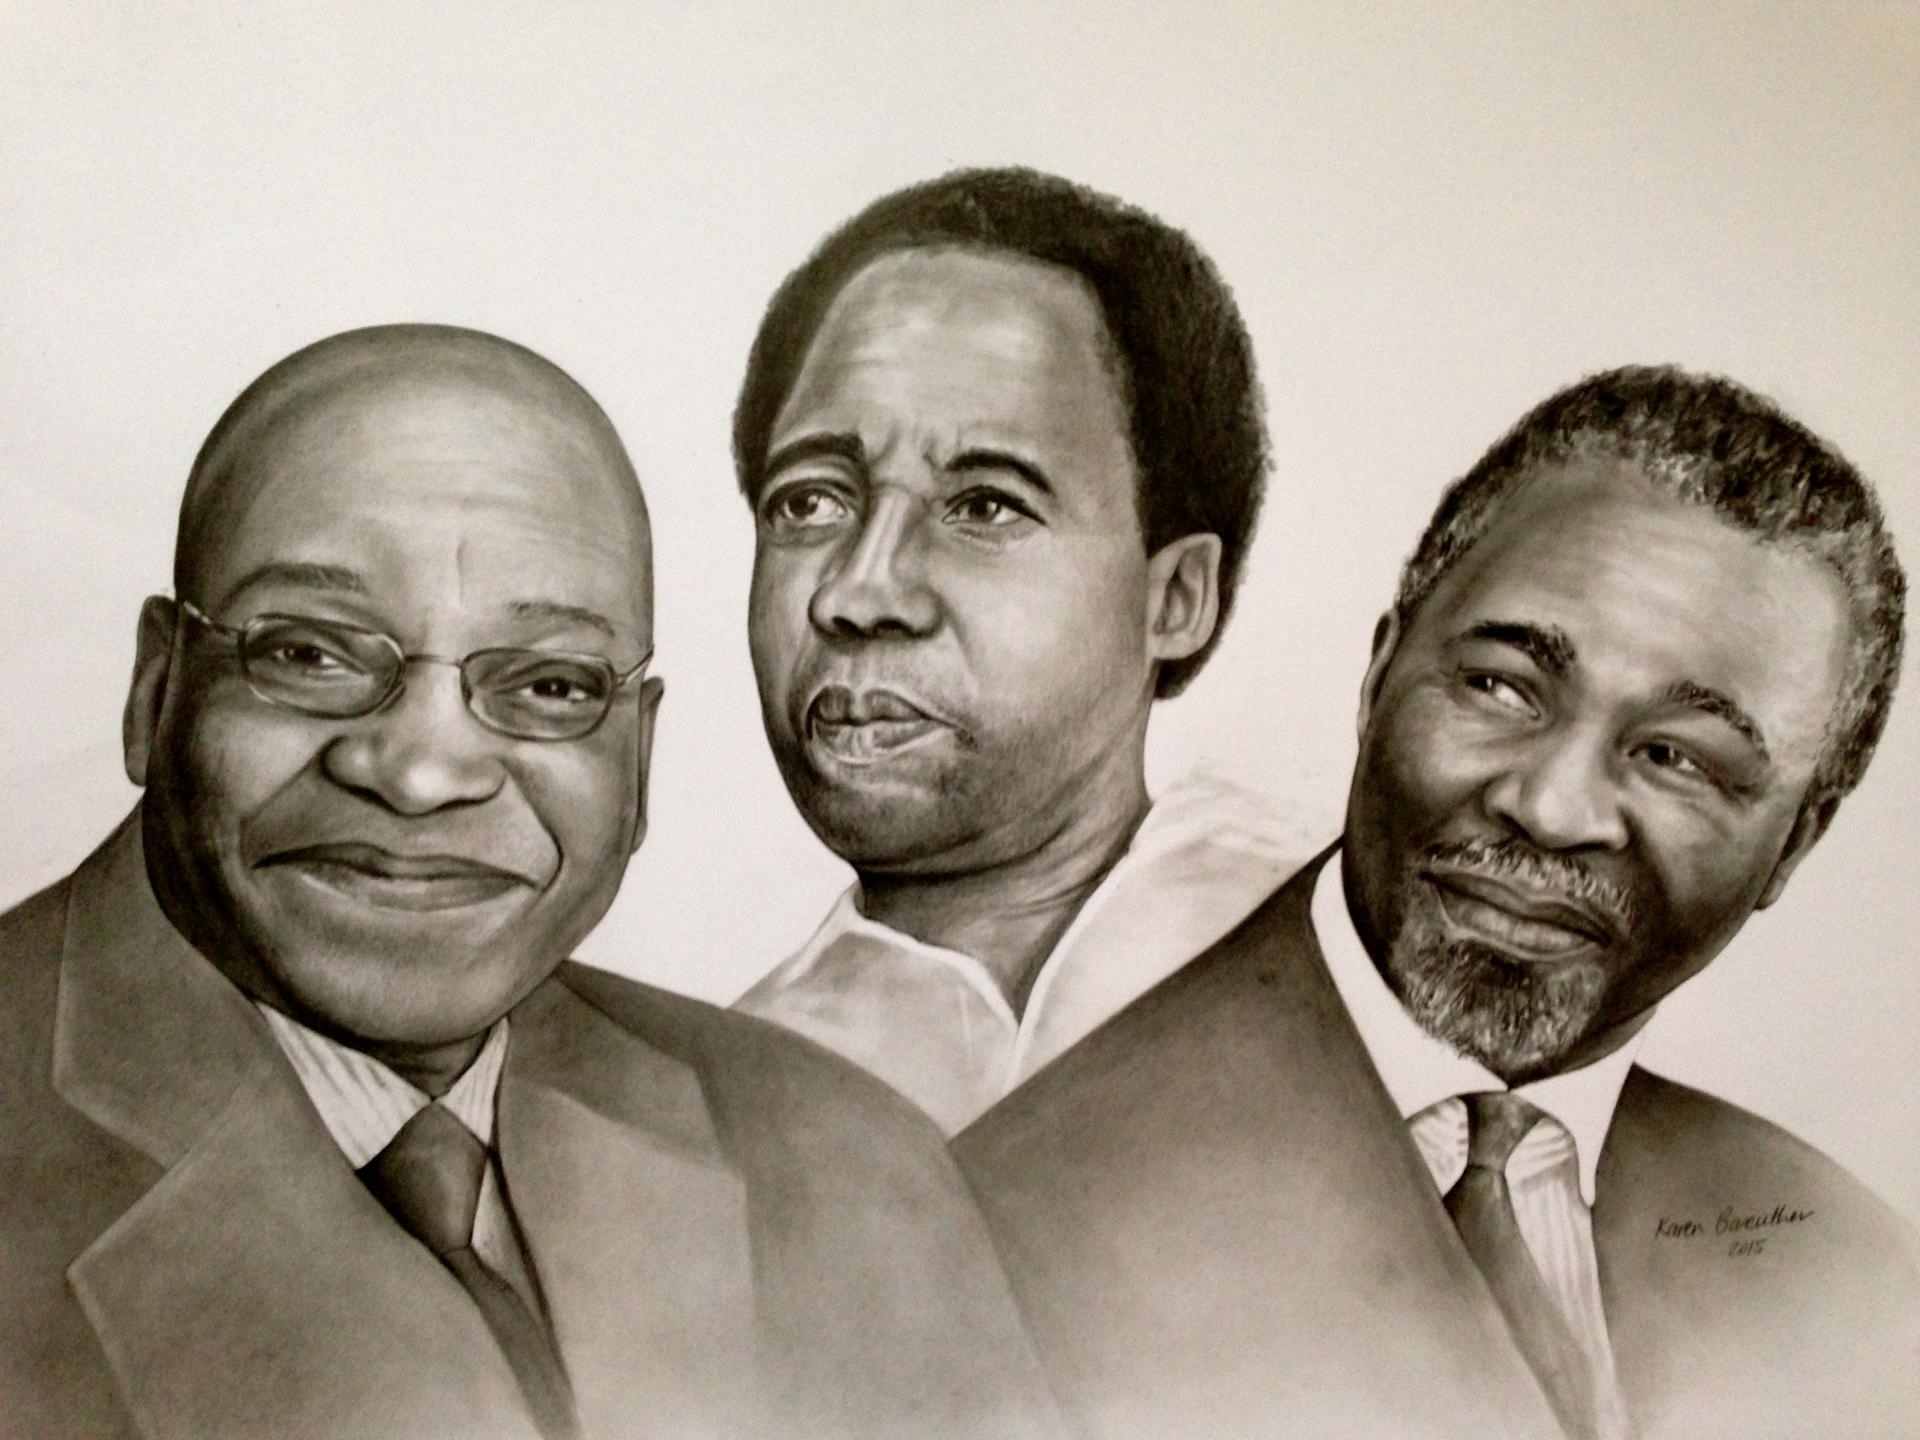 Struggle Heroes, pencil